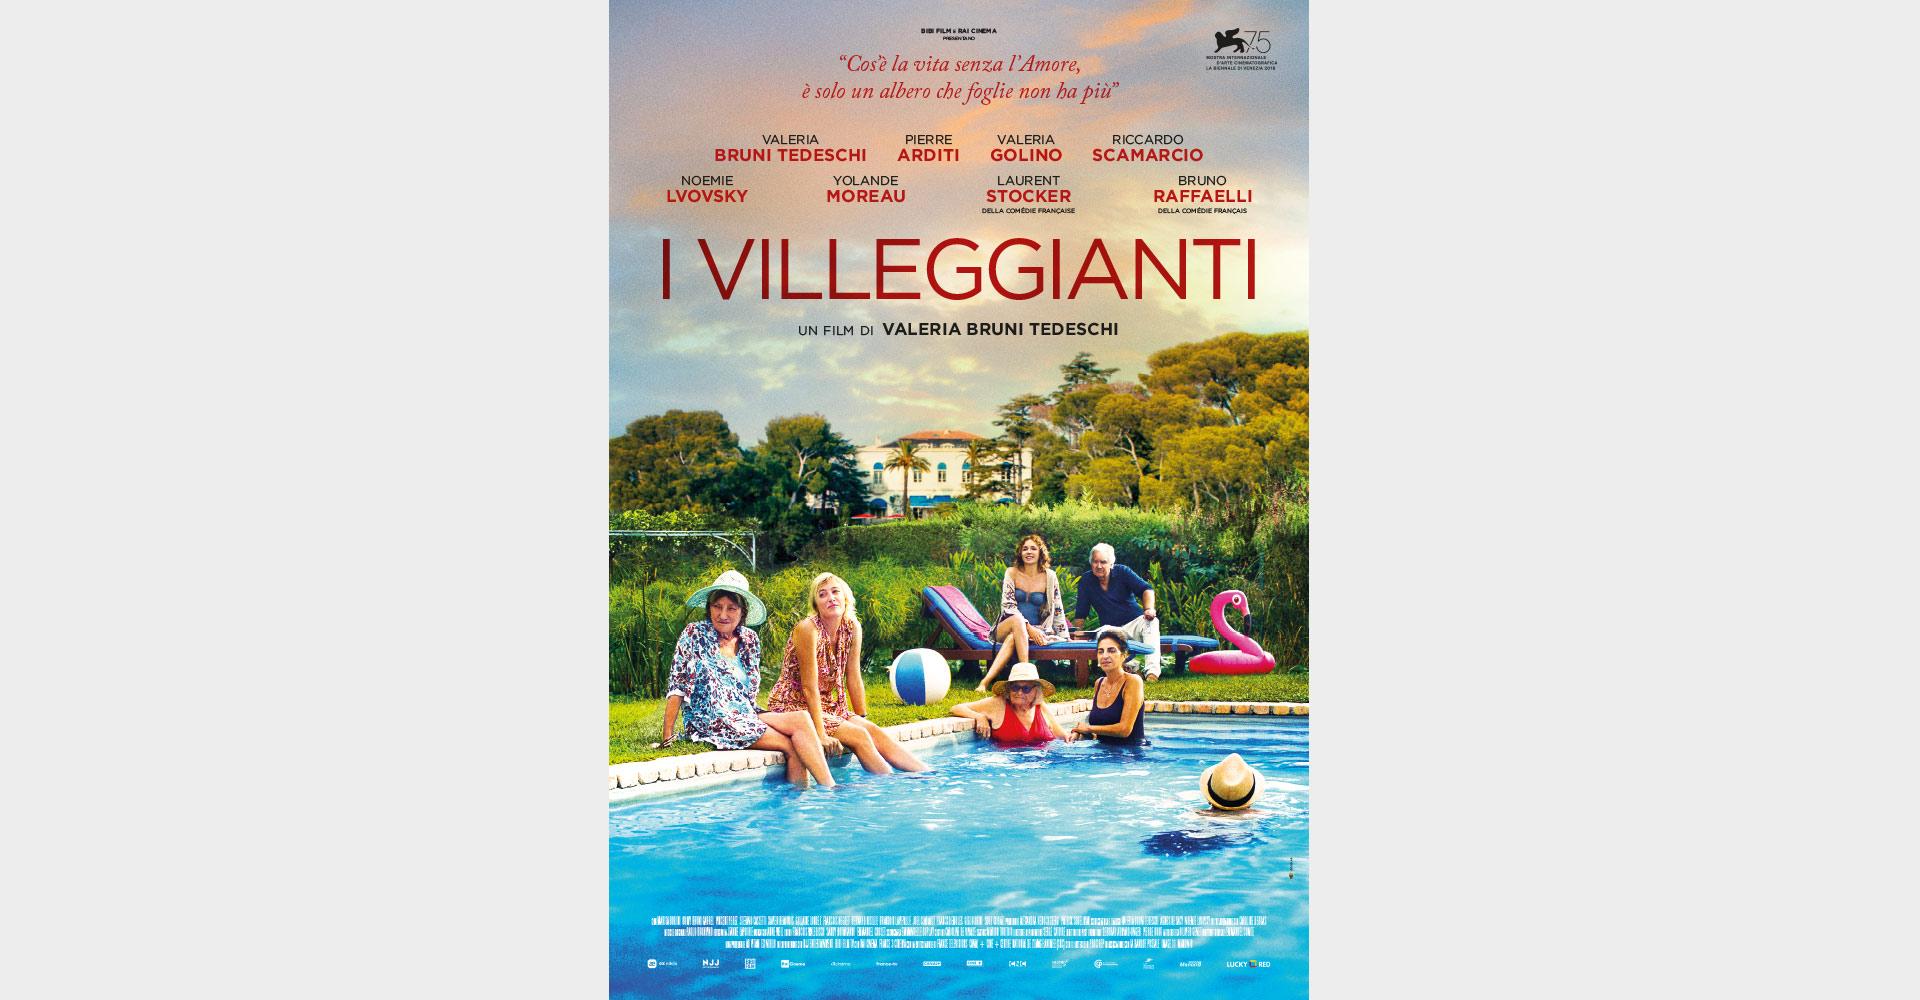 Villeggianti_Behance_01